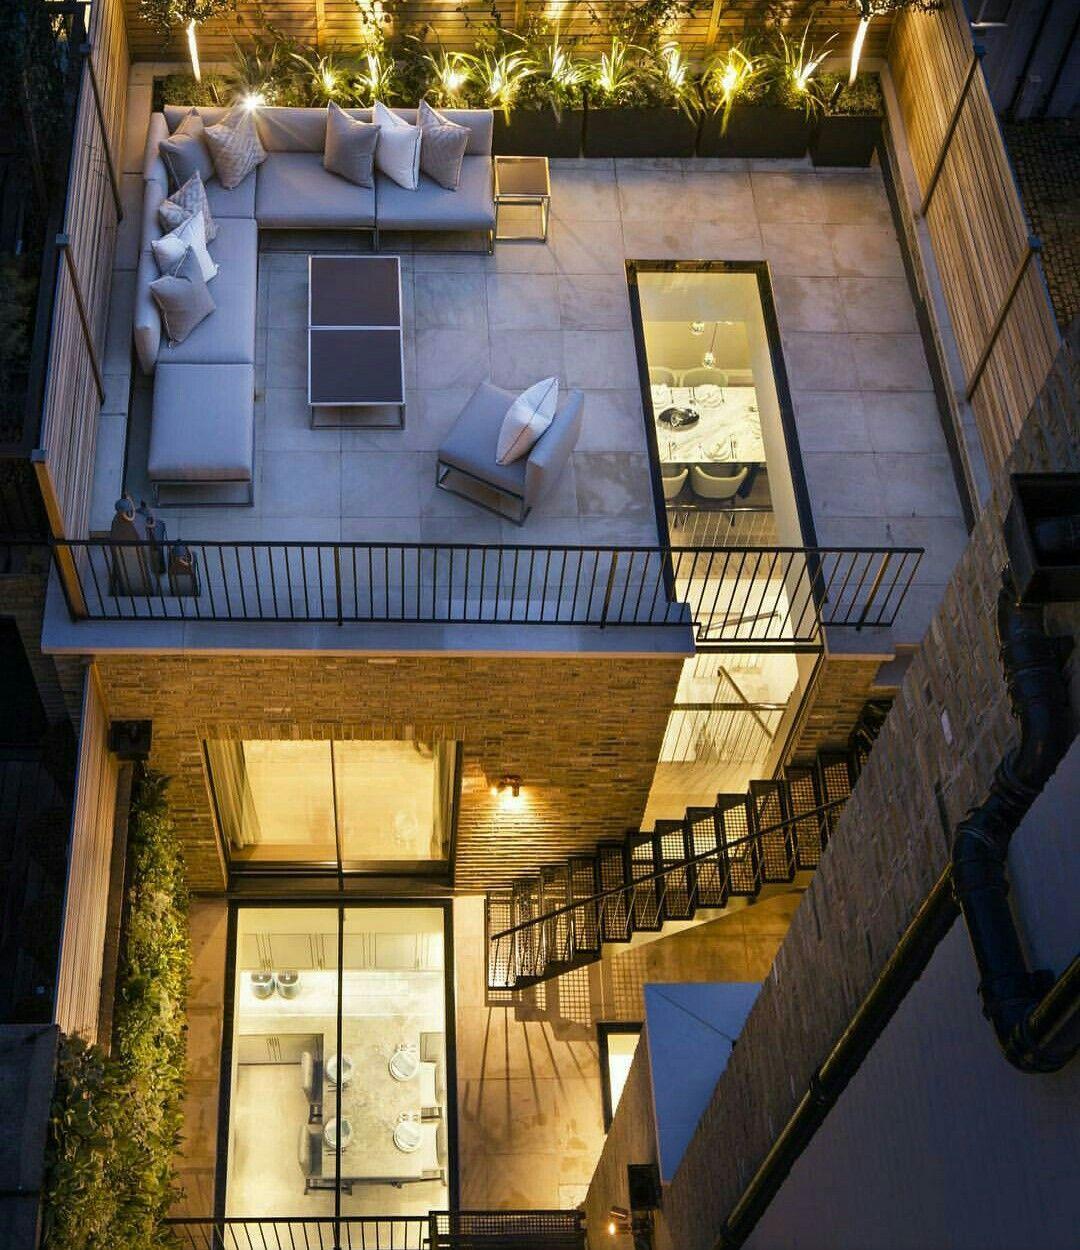 Pin von Juan Escarrega auf Dream Houses | Pinterest | Dachterrassen ...